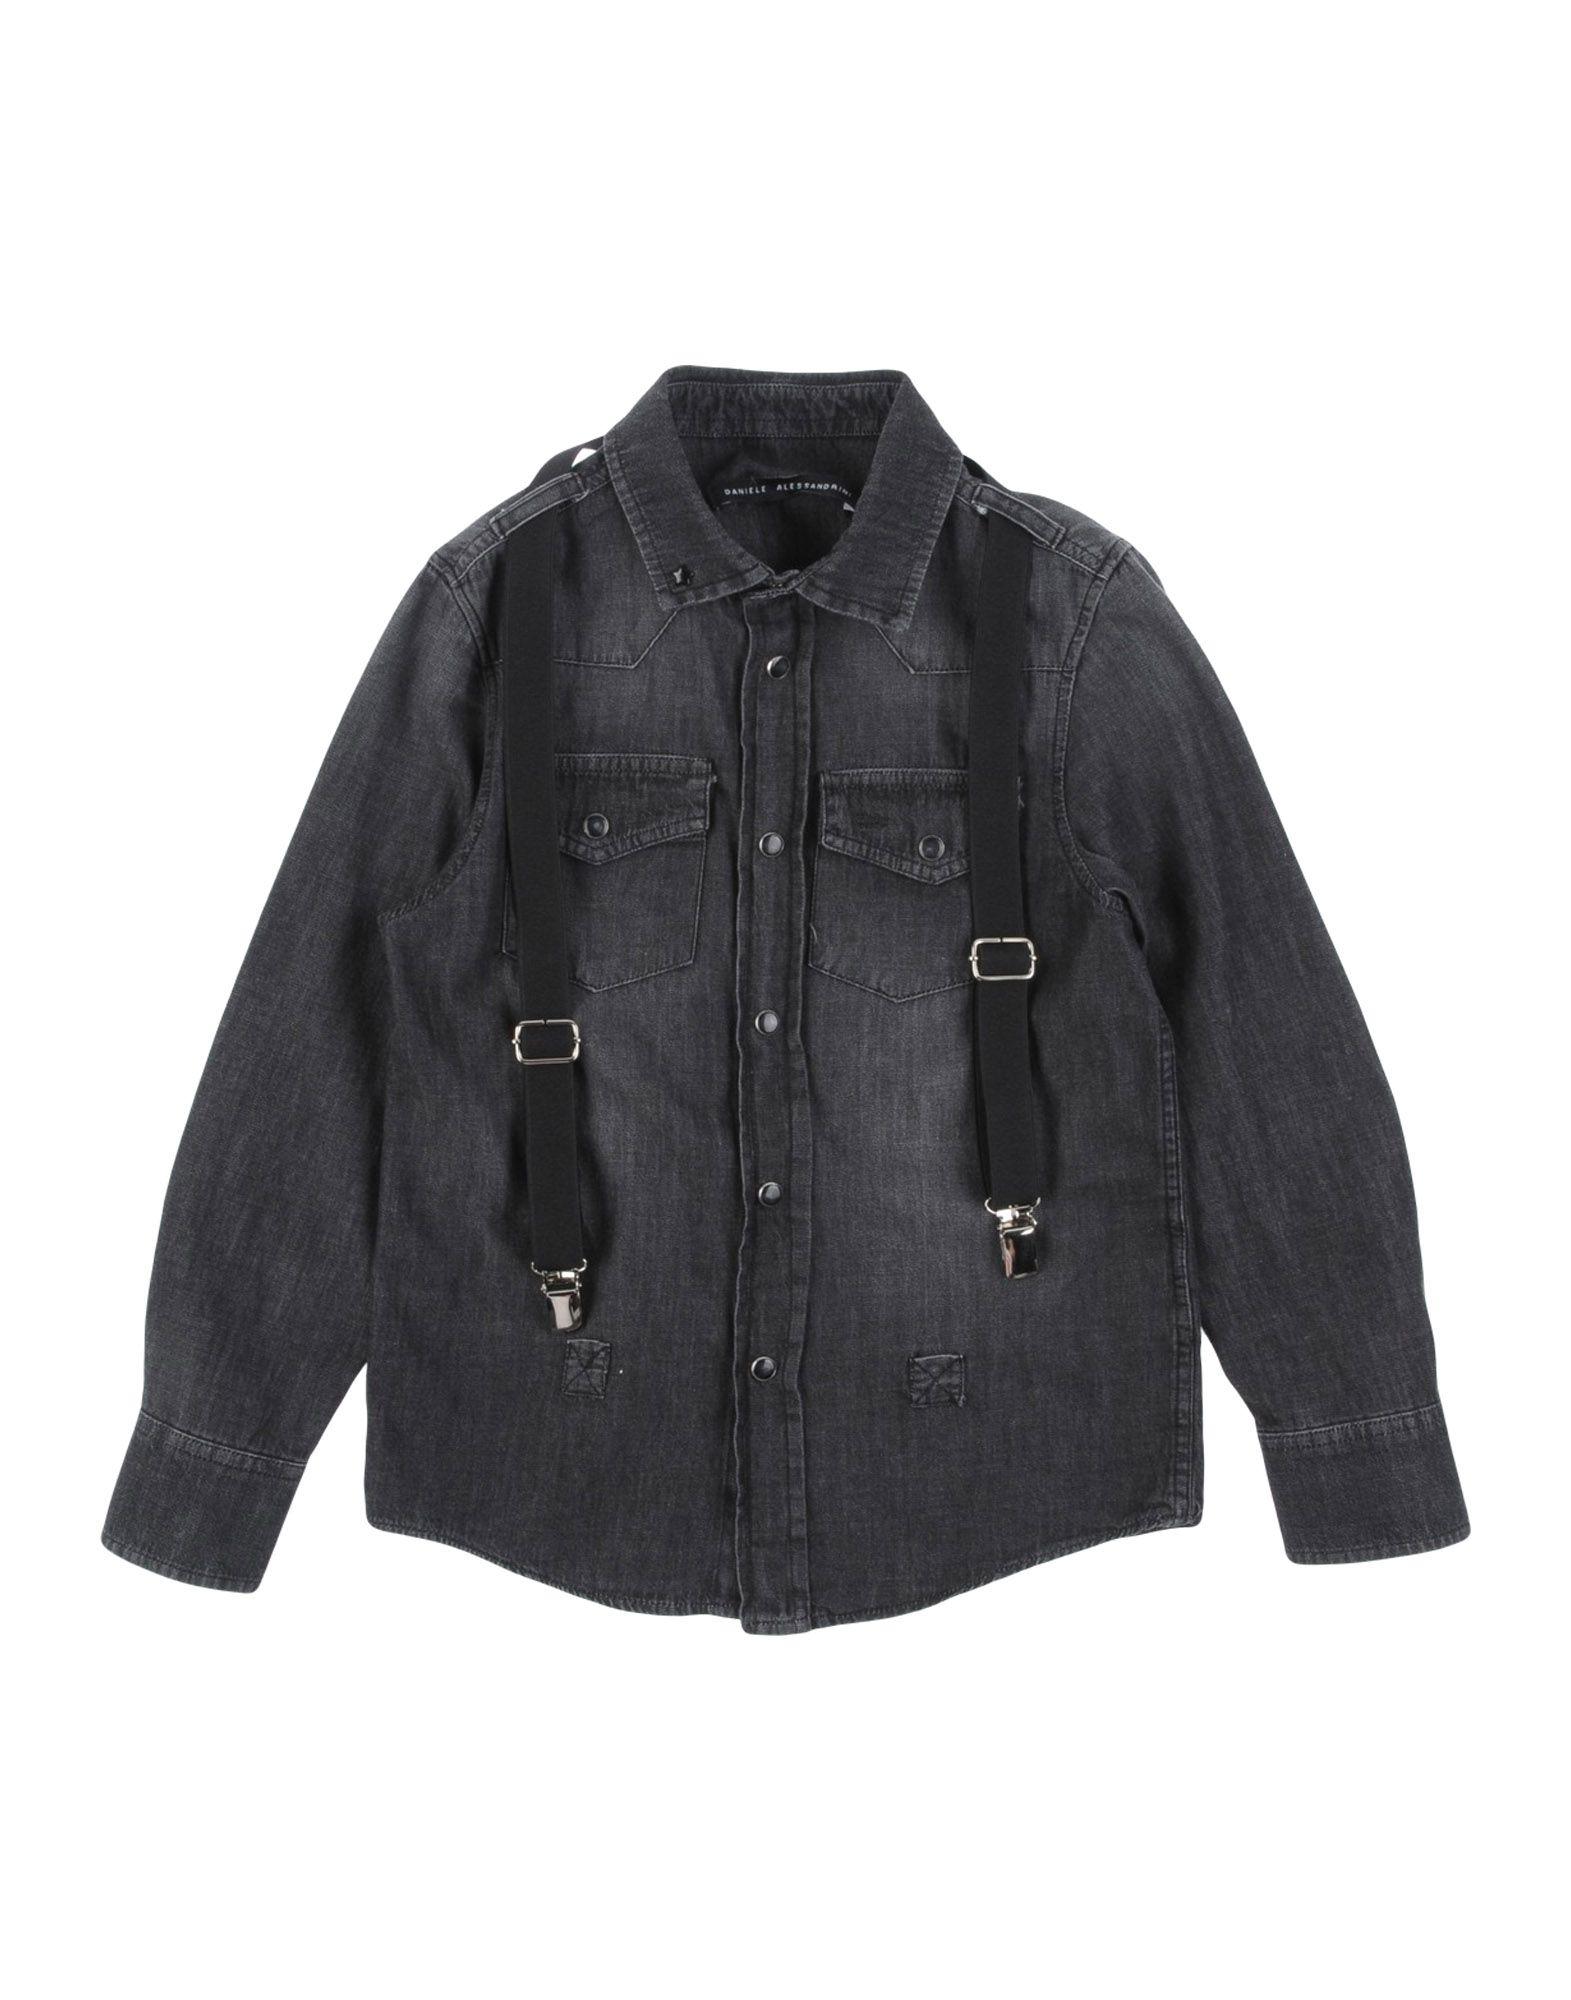 DANIELE ALESSANDRINI Джинсовая рубашка daniele alessandrini сорочка daniele alessandrini c1410b762c3205 40 цветной